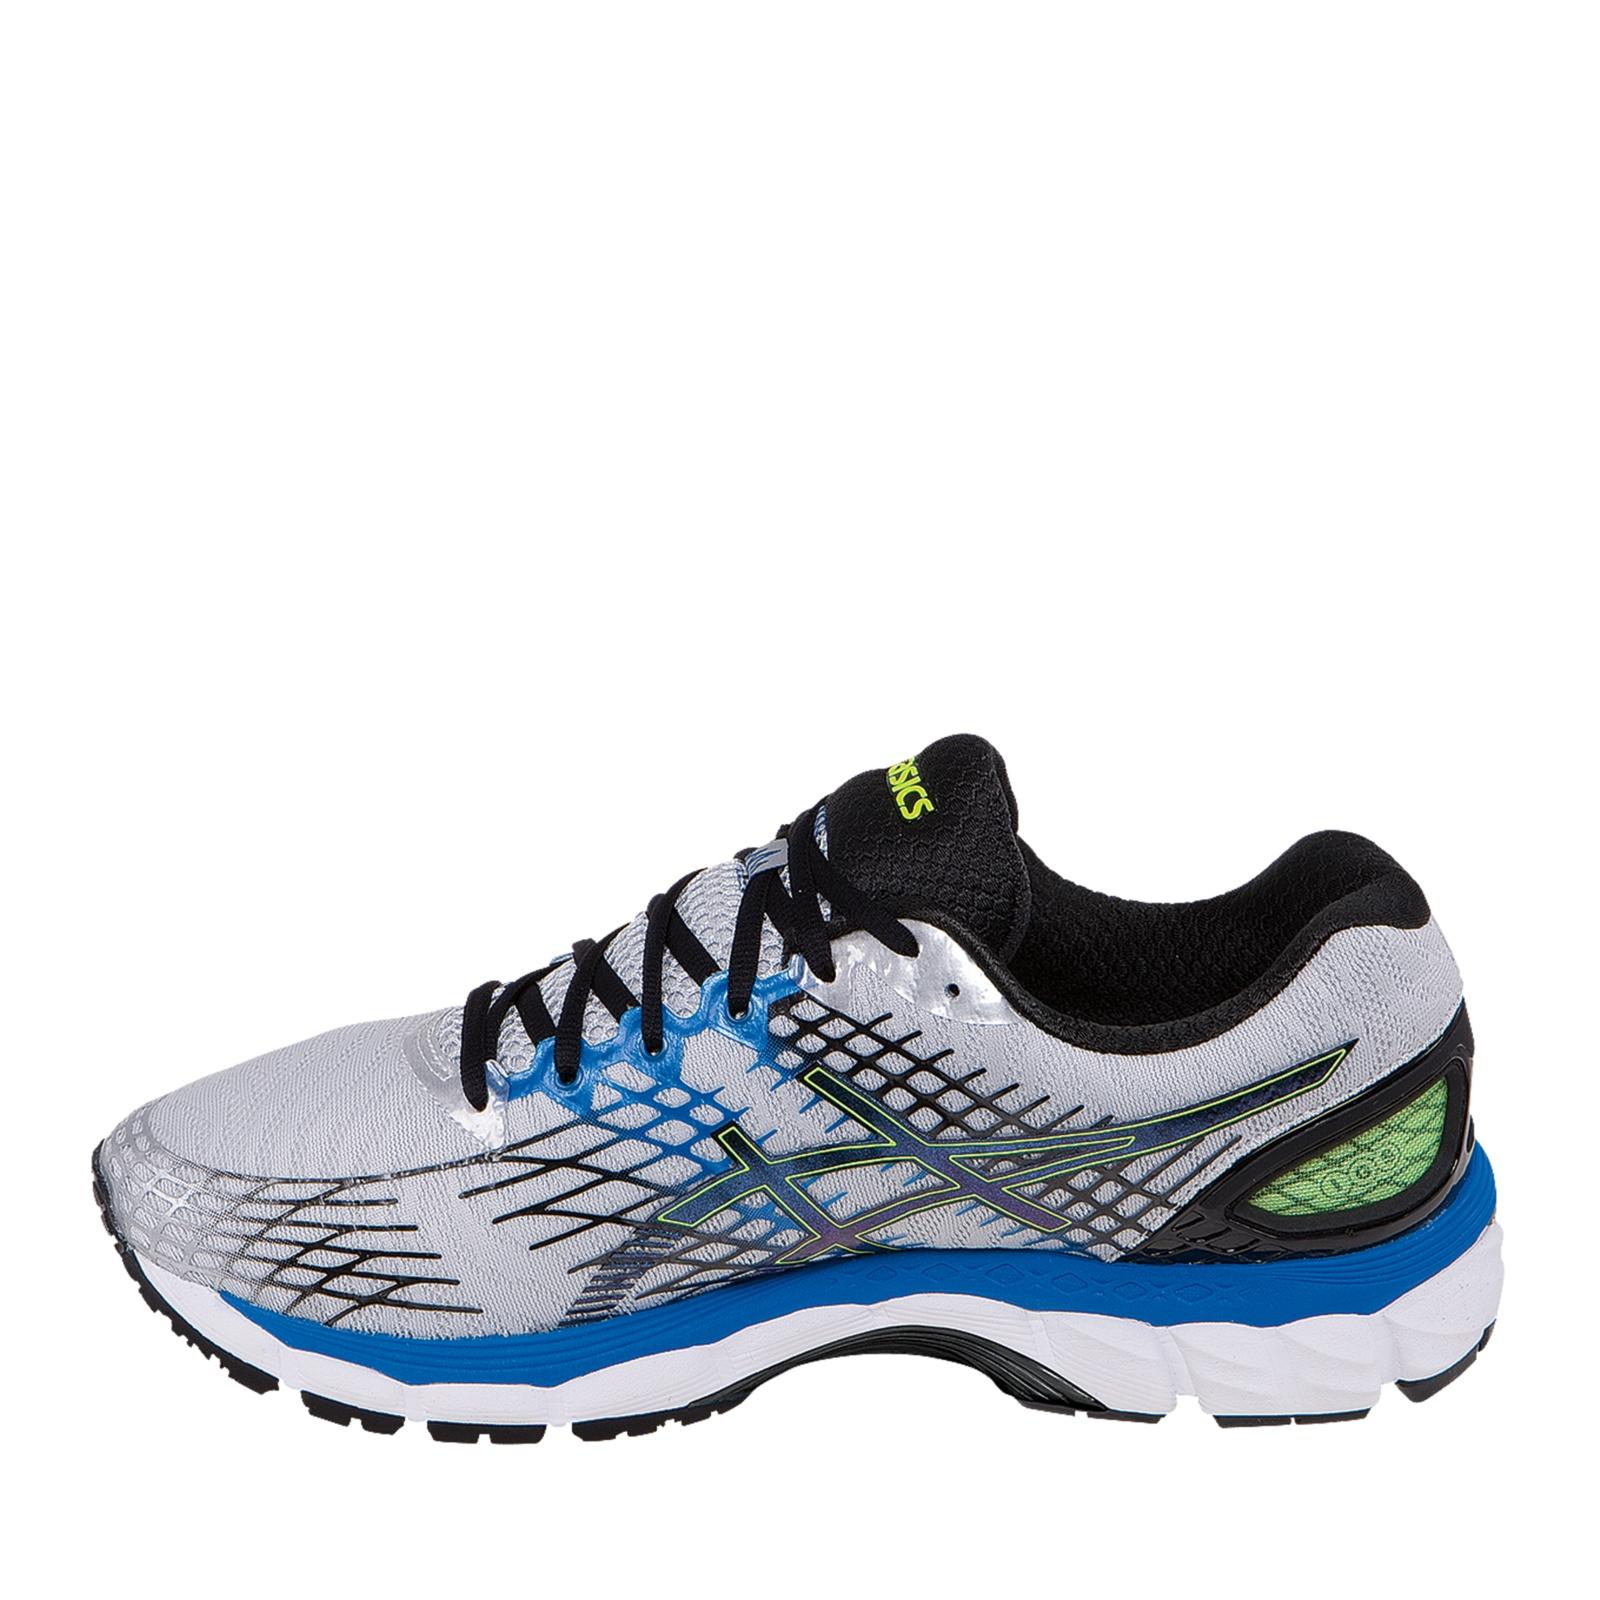 asics s gel nimbus 17 running shoes sizes 8 12 will